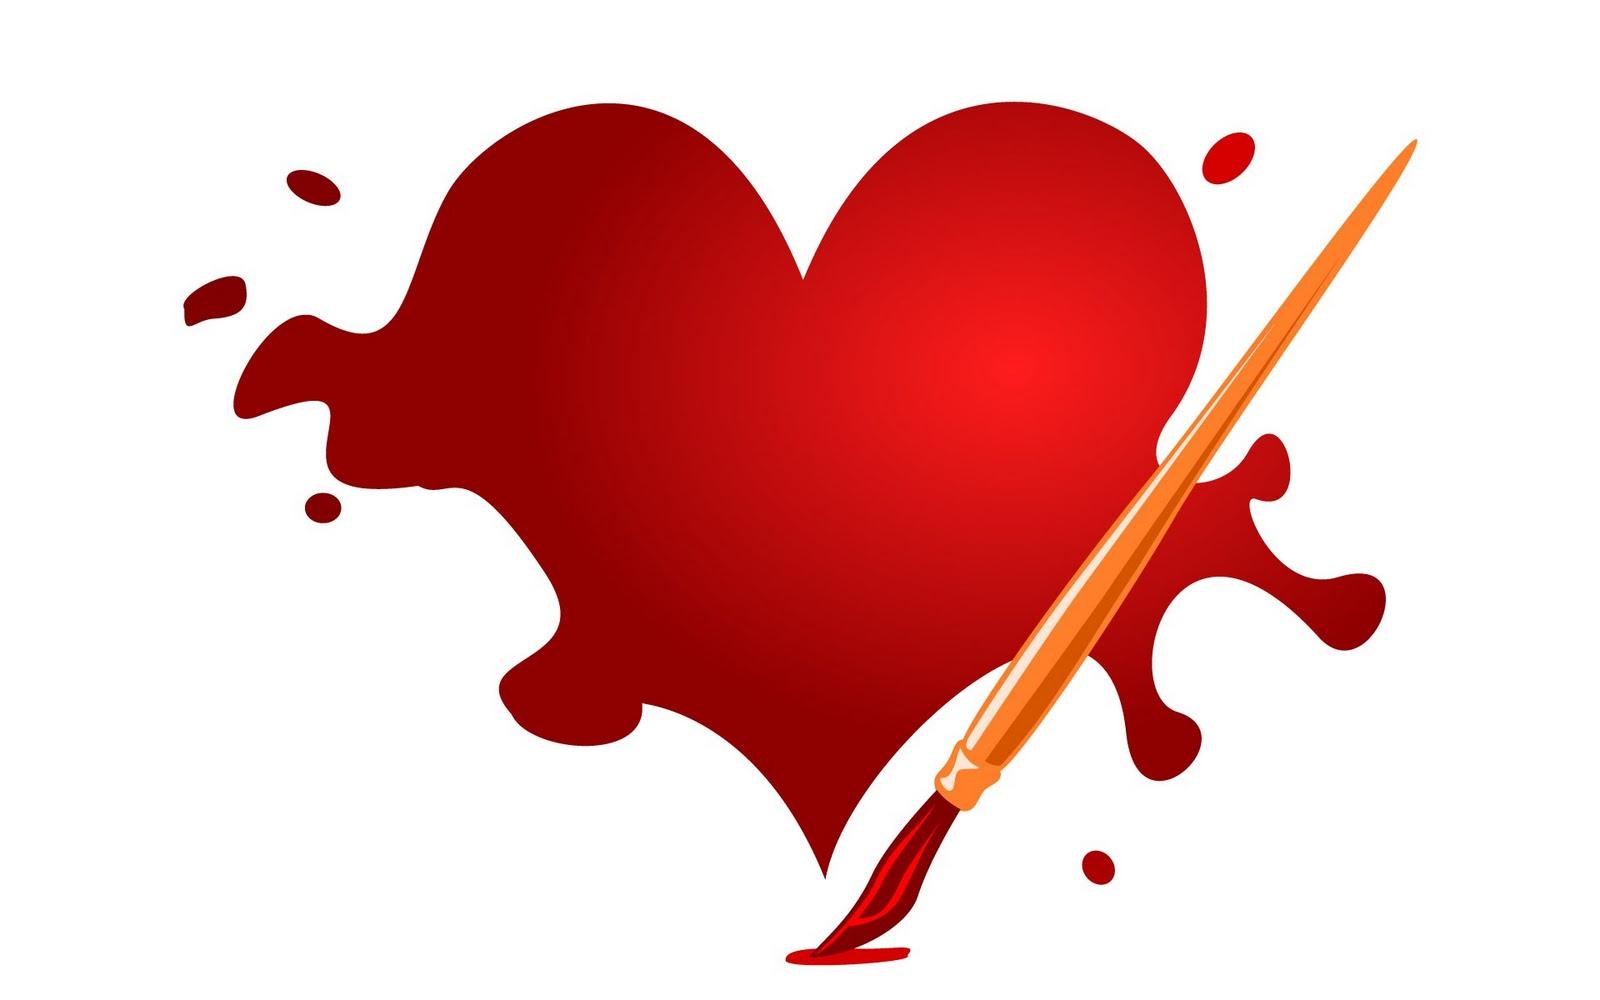 http://1.bp.blogspot.com/-EUW6igpzMHg/TZmnXTVUhRI/AAAAAAAAym8/P39QZy_5OWE/s1600/Valentines-Day-7.jpg